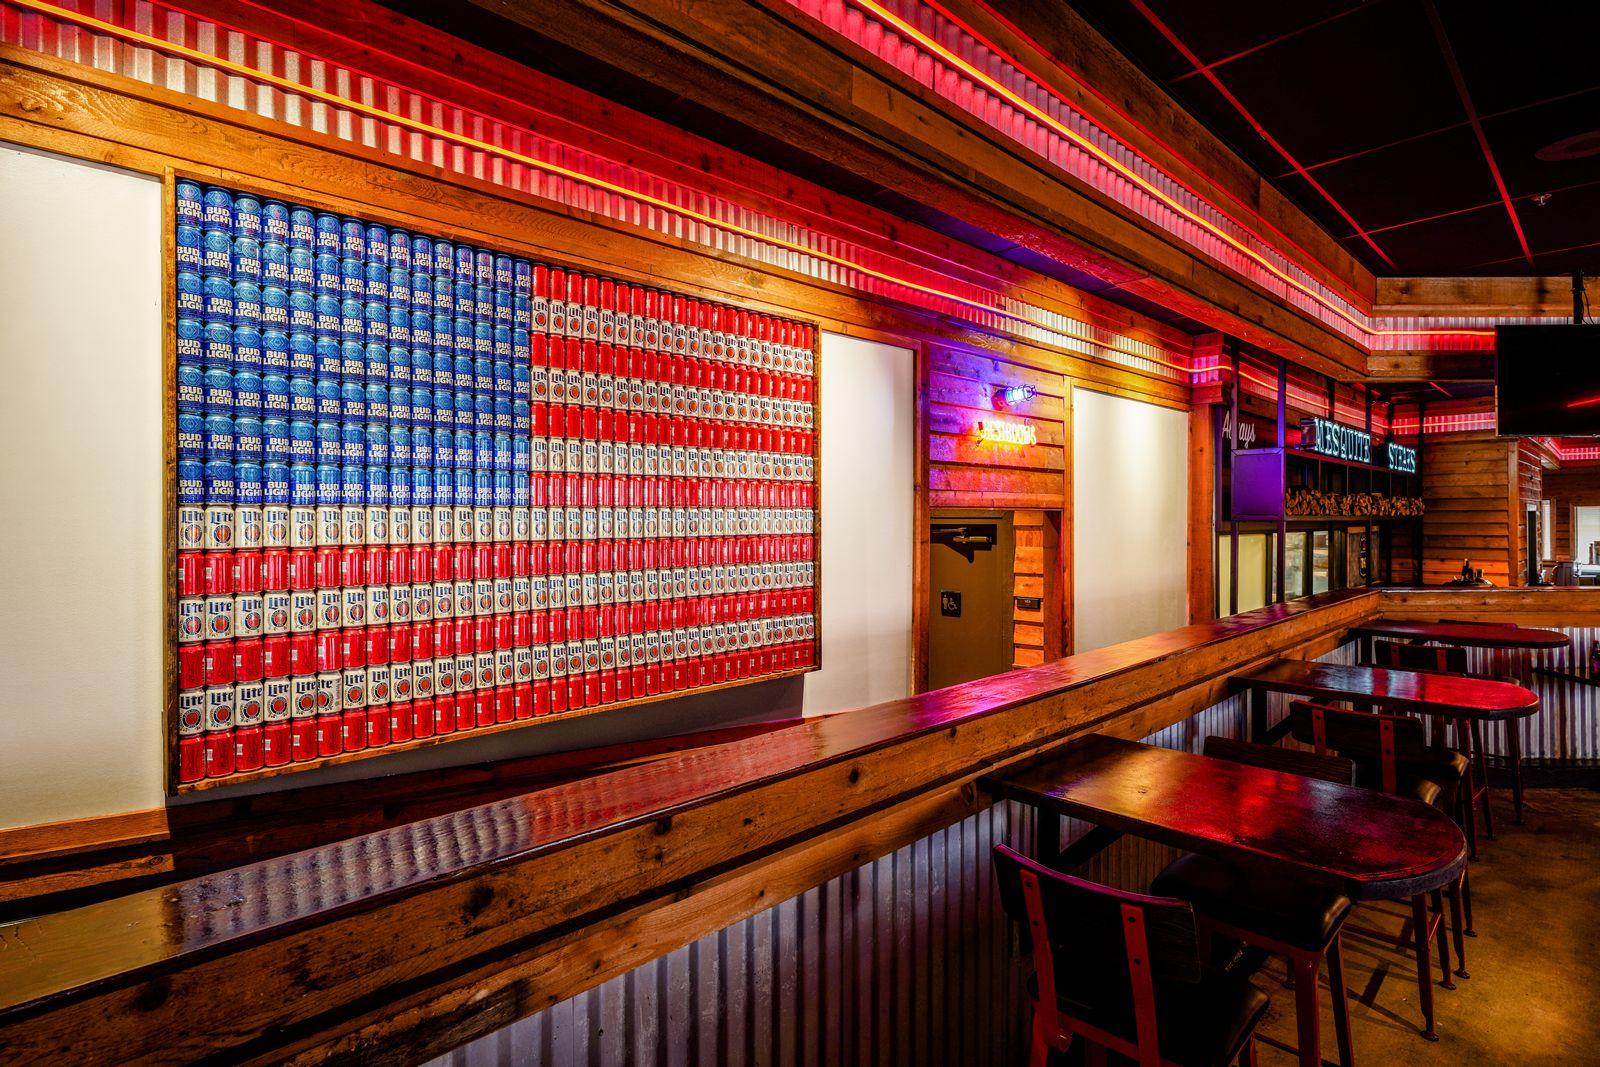 Logan's Roadhouse Celebrates Grand Reopening of Remodeled Restaurant